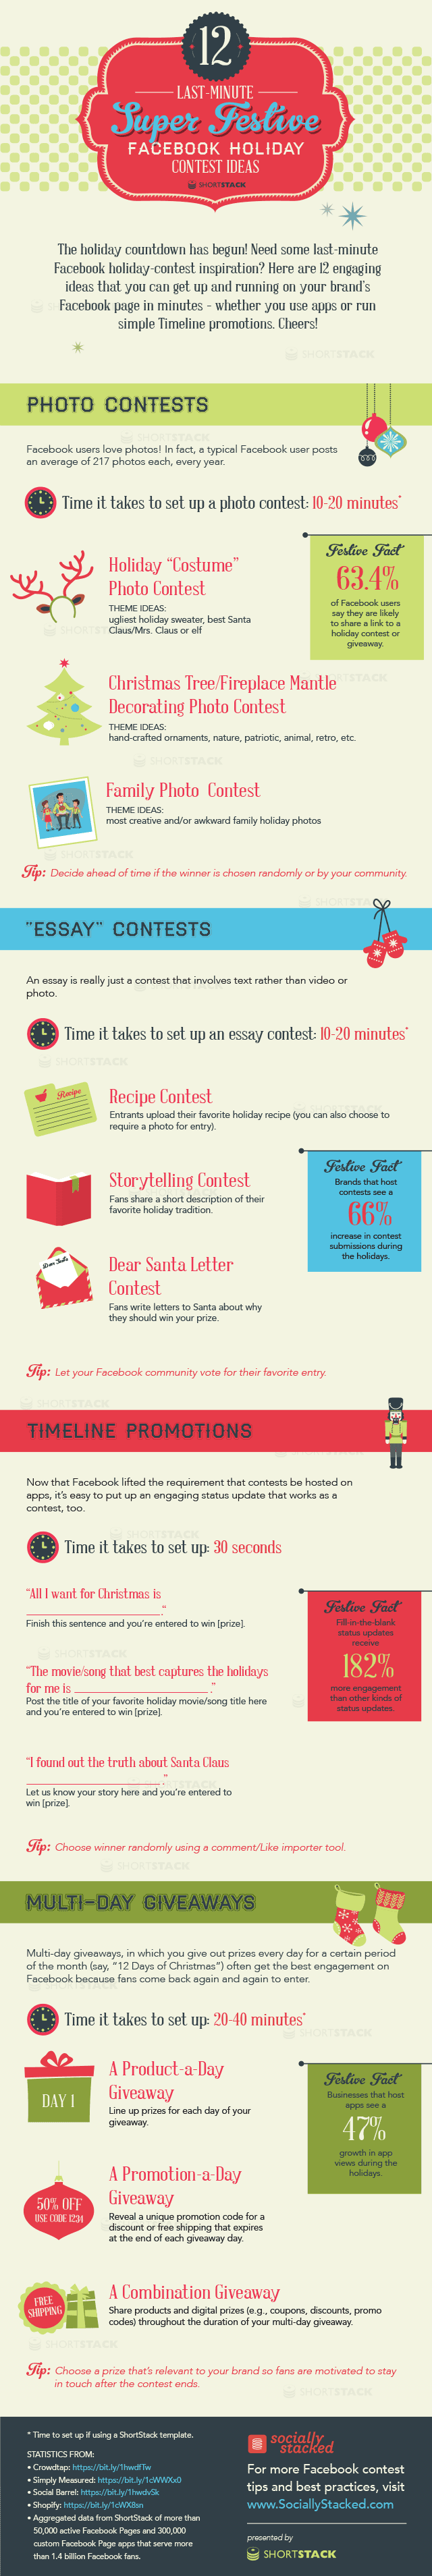 facebook holiday contests 12 last minute super festive ideas original holiday contest ideas